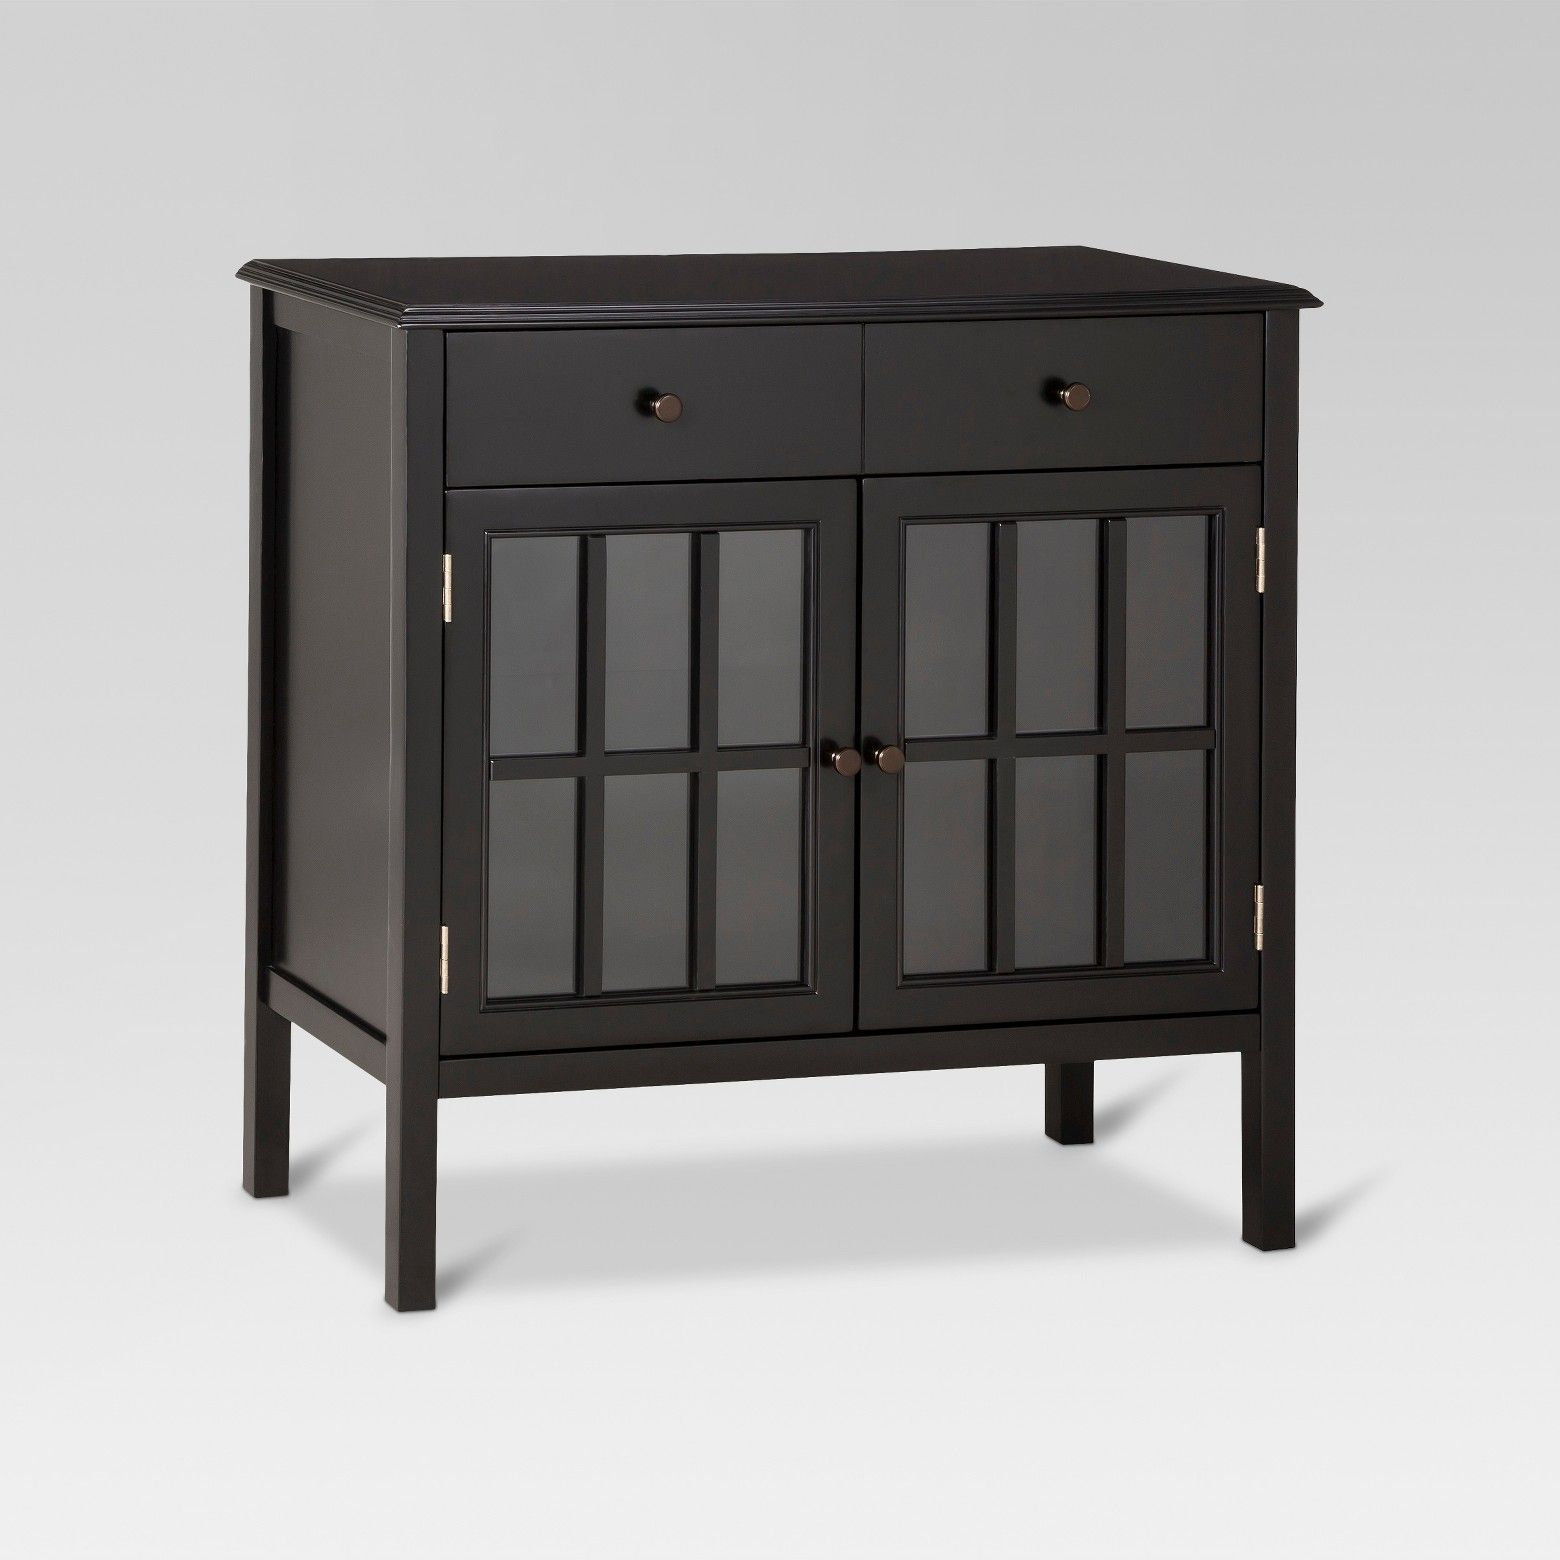 Windham 2 Door Cabinet With Drawers Threshold Storage Cabinet With Drawers Cabinet Drawers Cabinet